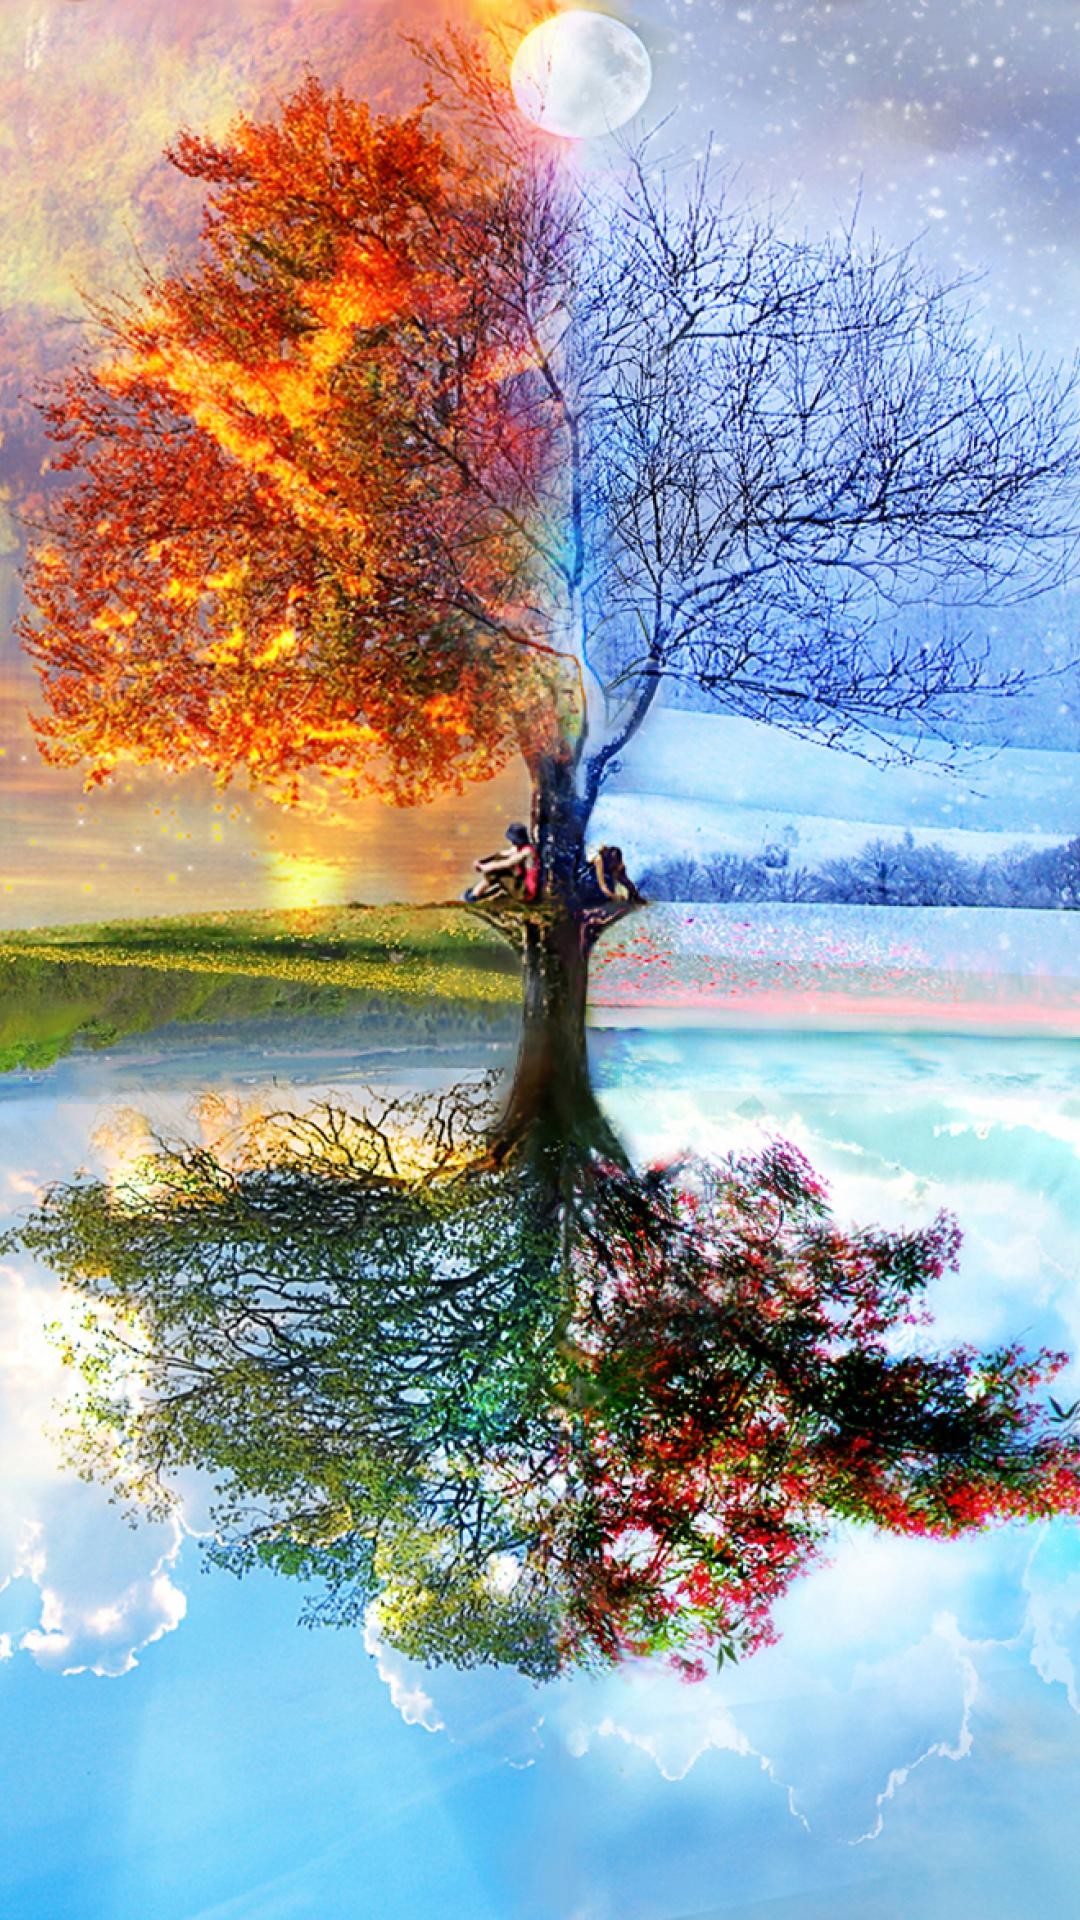 1080x1920, Winter Iphone Wallpaper Iphone 6 Plus Four - Half Dead Half Alive Tree Painting - HD Wallpaper